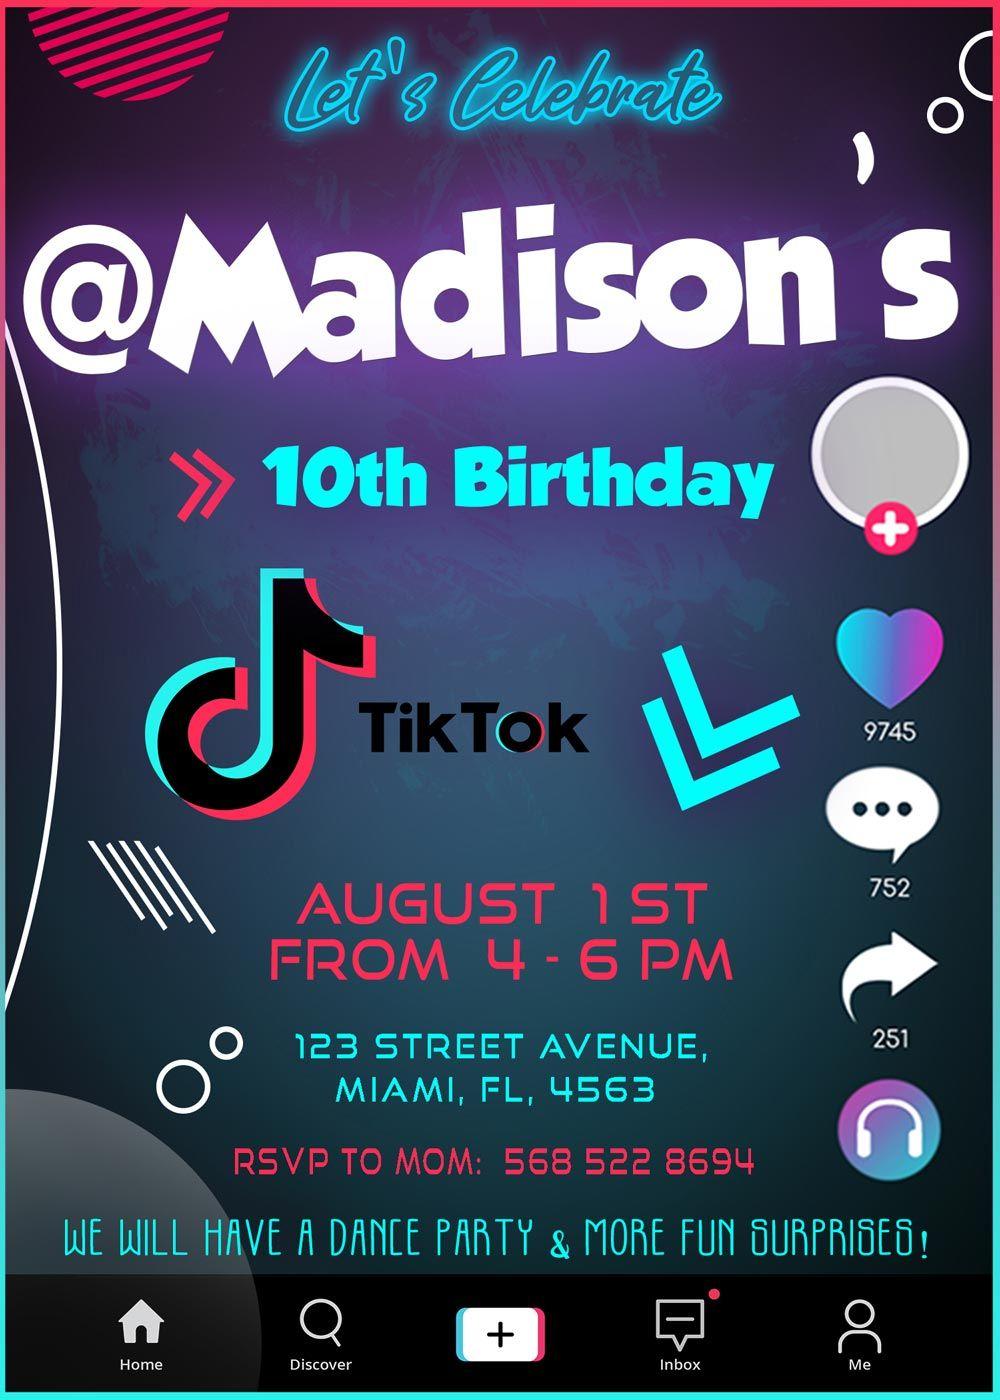 Fantastic Tik Tok Party Birthday Invitation Oscarsitosroom Birthday Party Invitations Free Birthday Party Invitations Printable Birthday Invitations